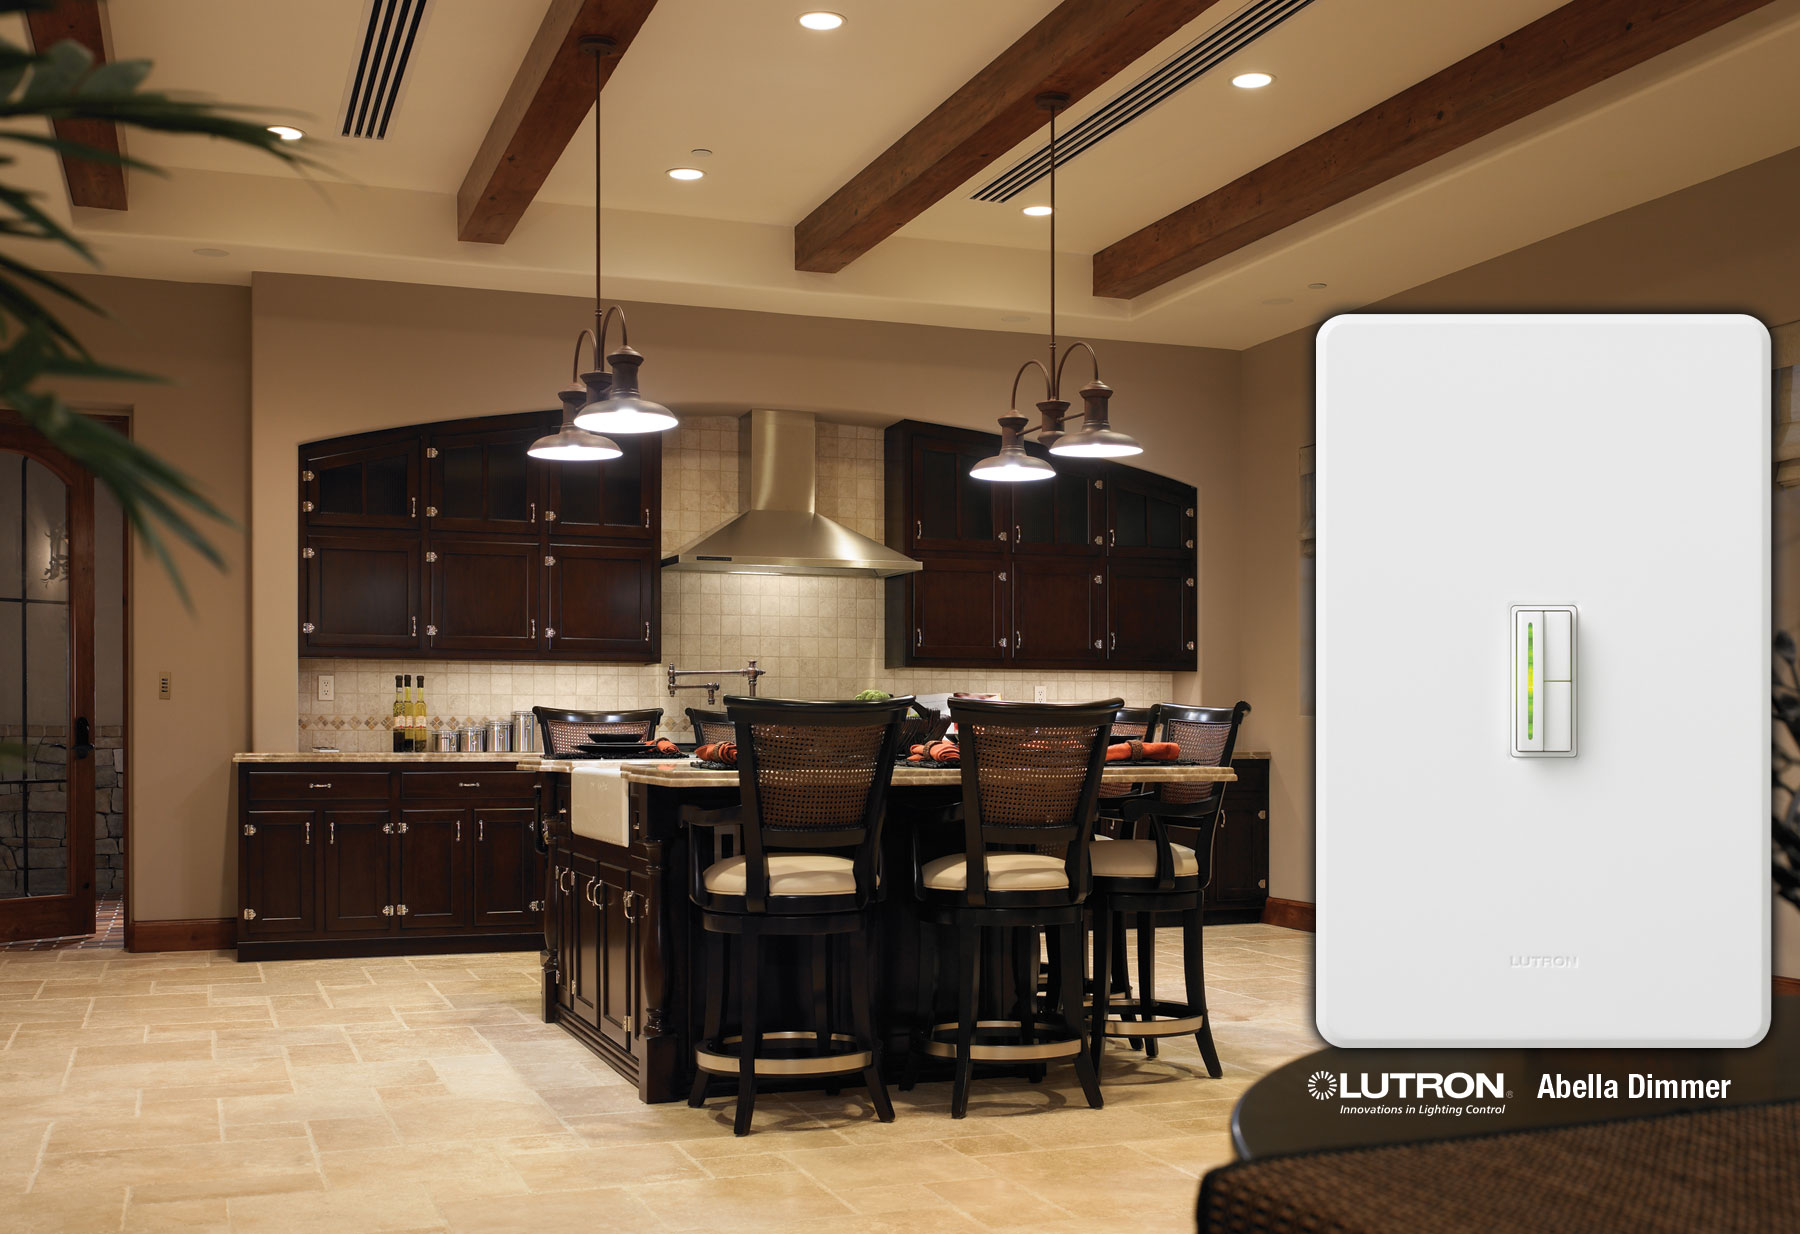 Lutron Lighting Controls Save Money Rensen House Of Lights